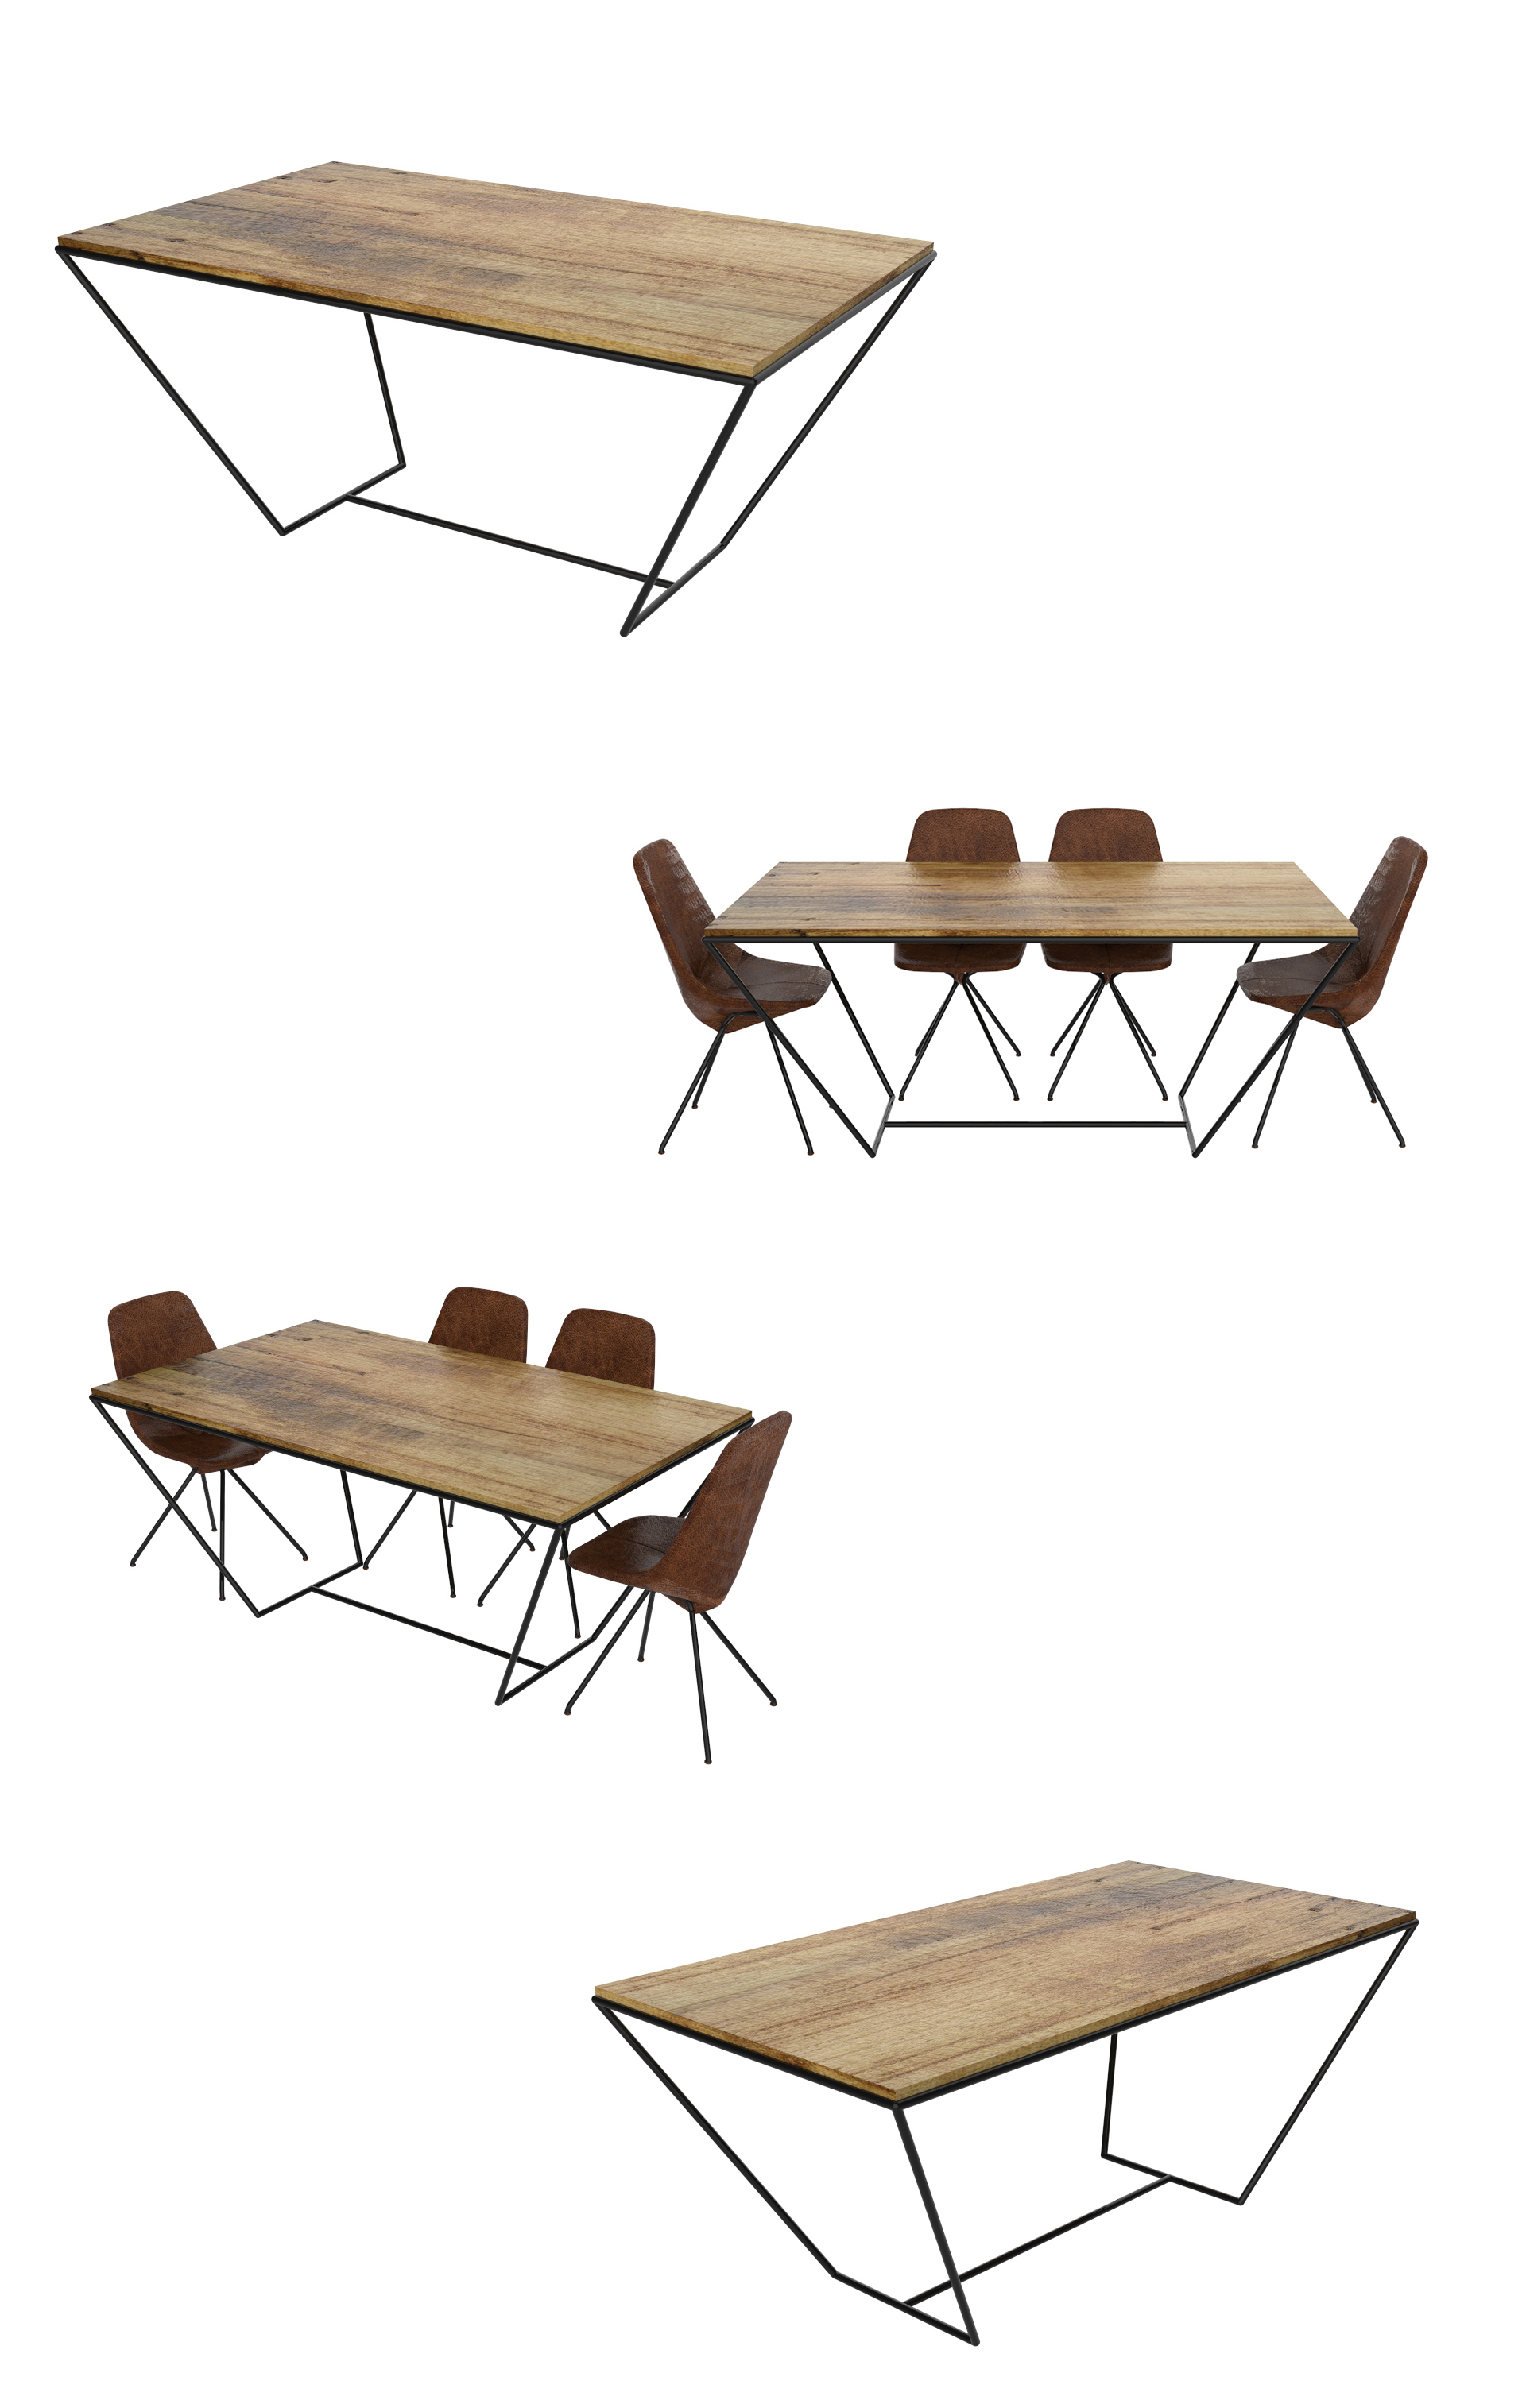 slant-stol-projekt-pawlowska-design